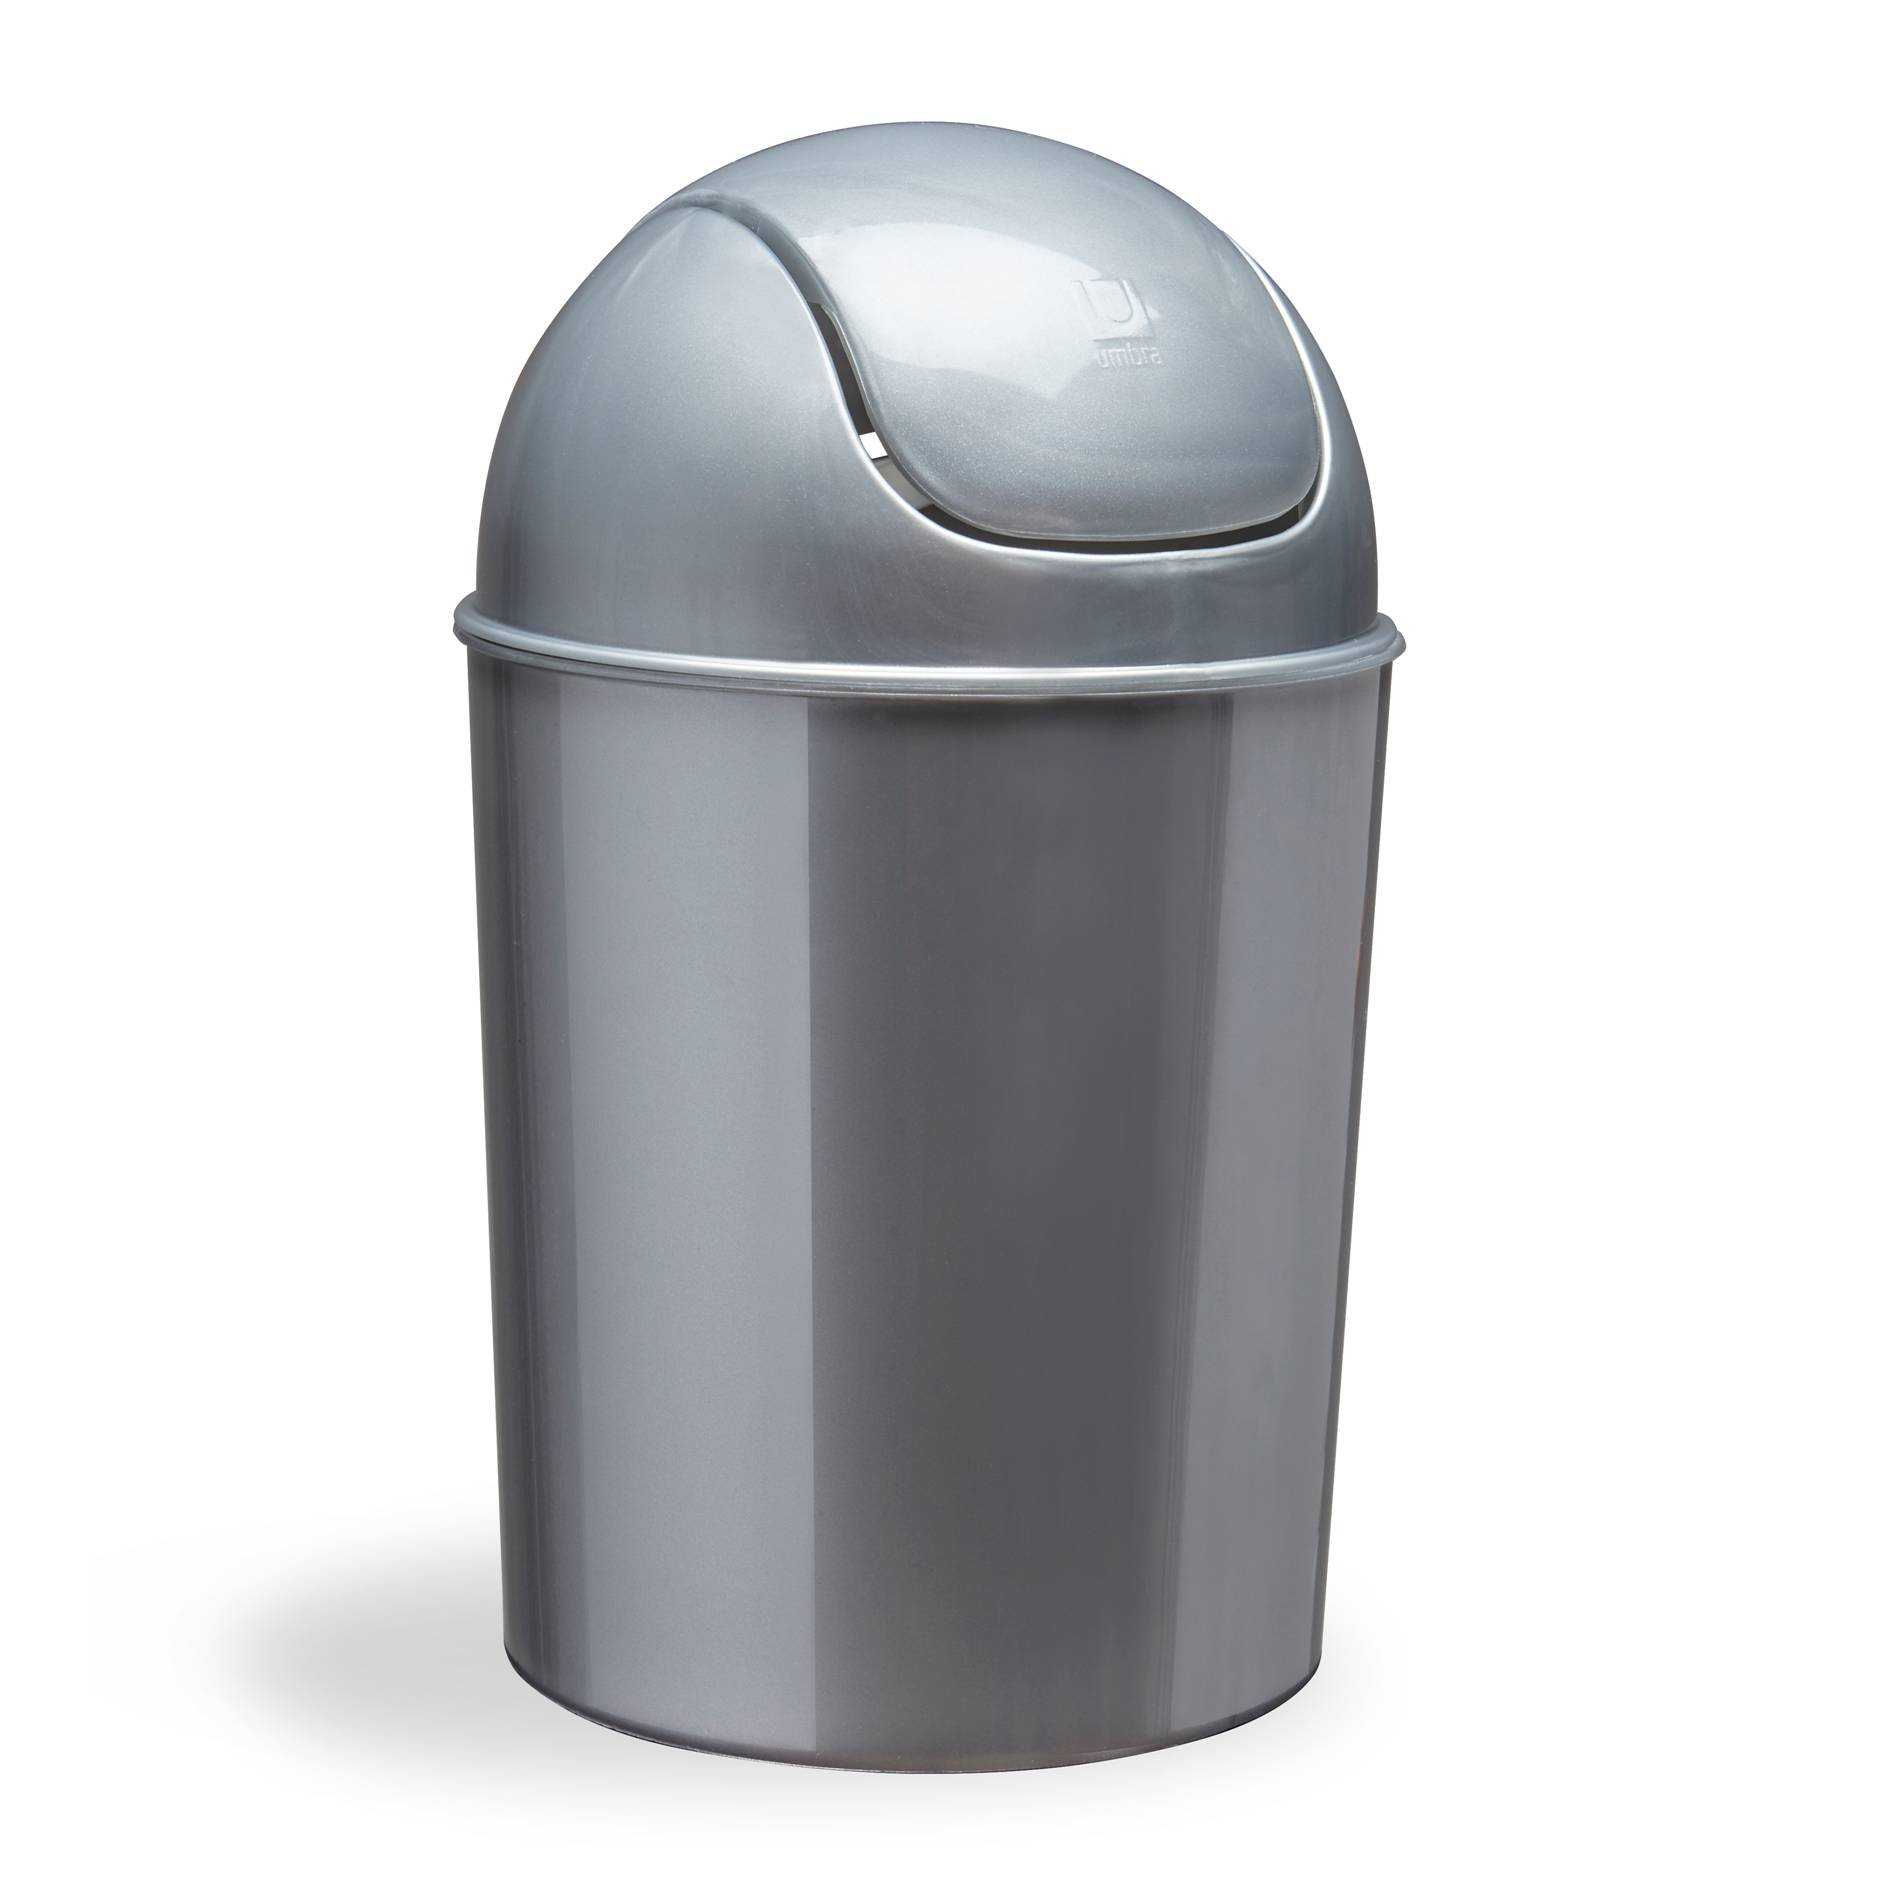 Mini Waste Can Trash Bin Garbage Small Bathroom Space Toilet Bedroom Useful  New Interior Bedroom Ideas ookie1.com